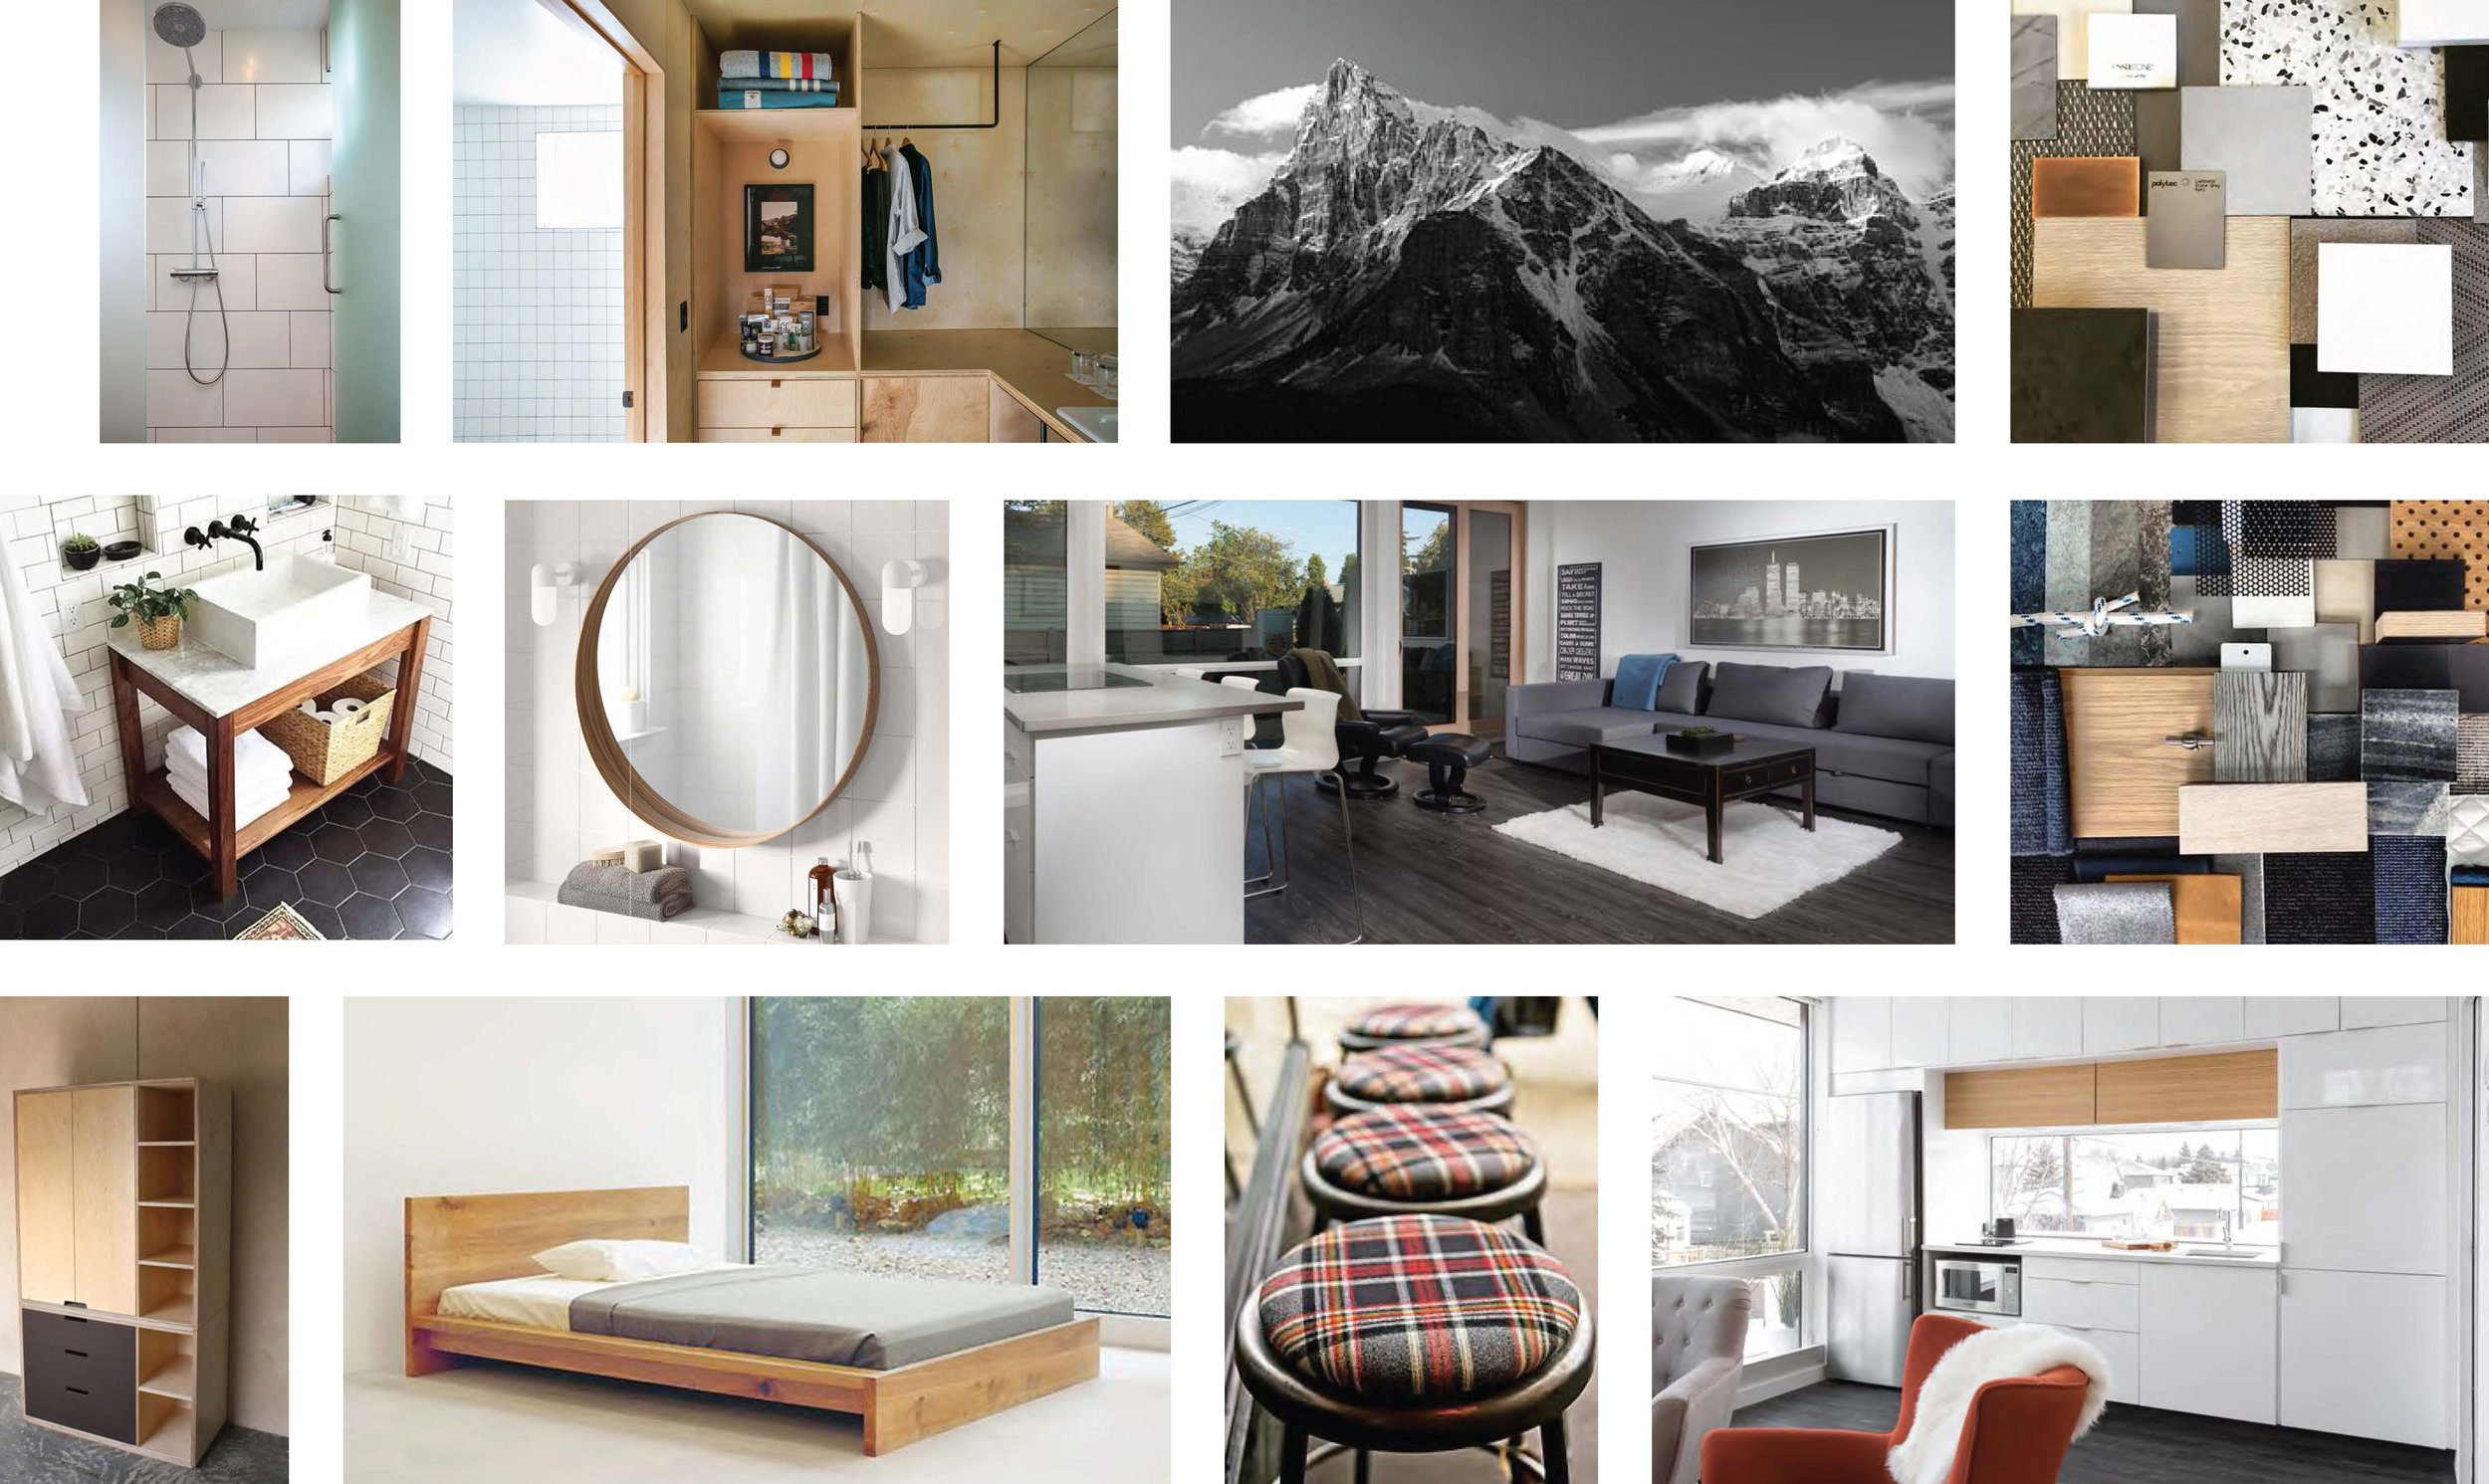 Interior Finishes & Furnishings